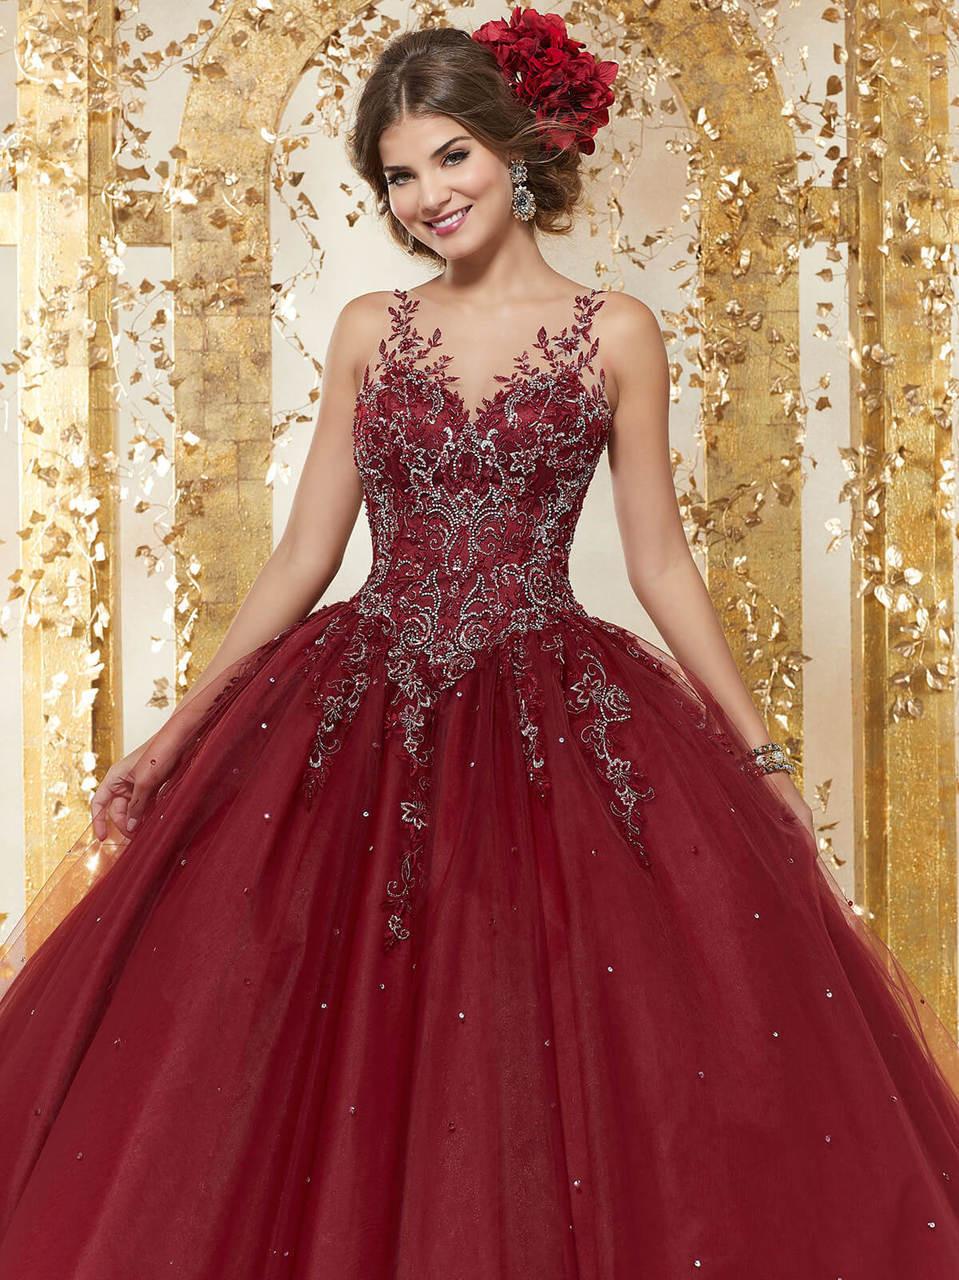 e115a83eb illusion neckline vizcaya quinceanera ball gown 89223. Free shipping